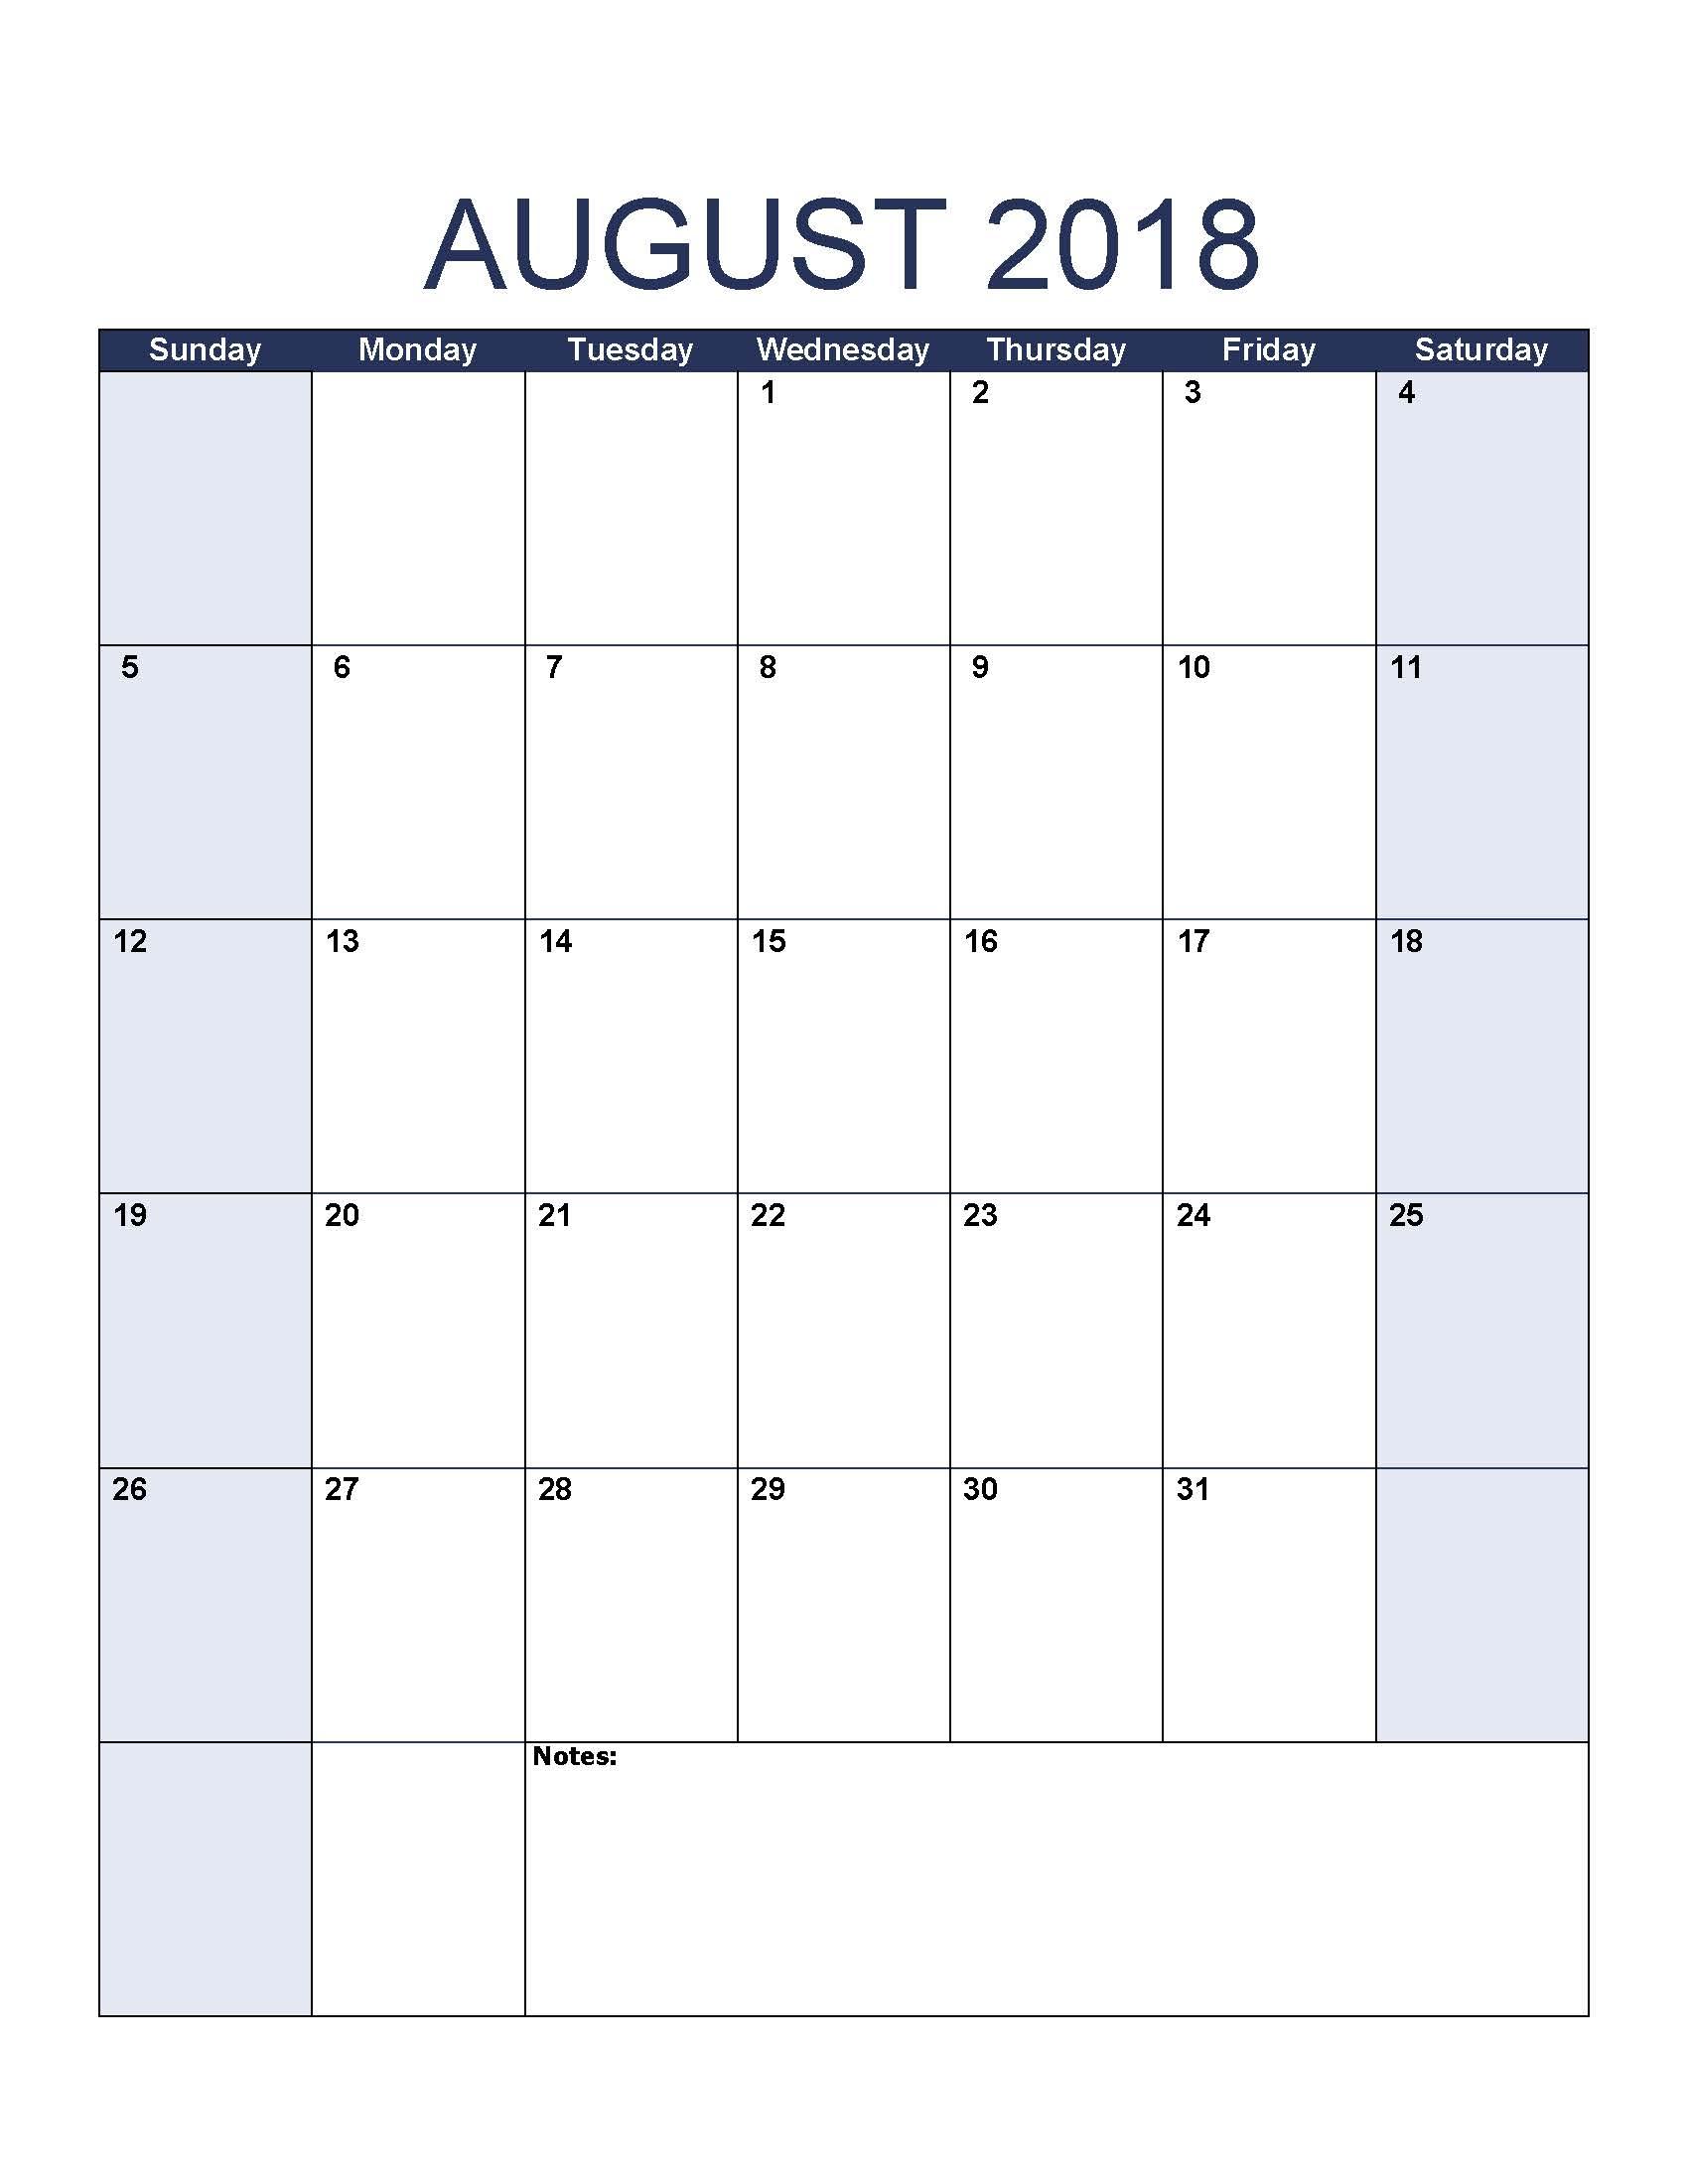 Blank August 2018 Calendar To Print